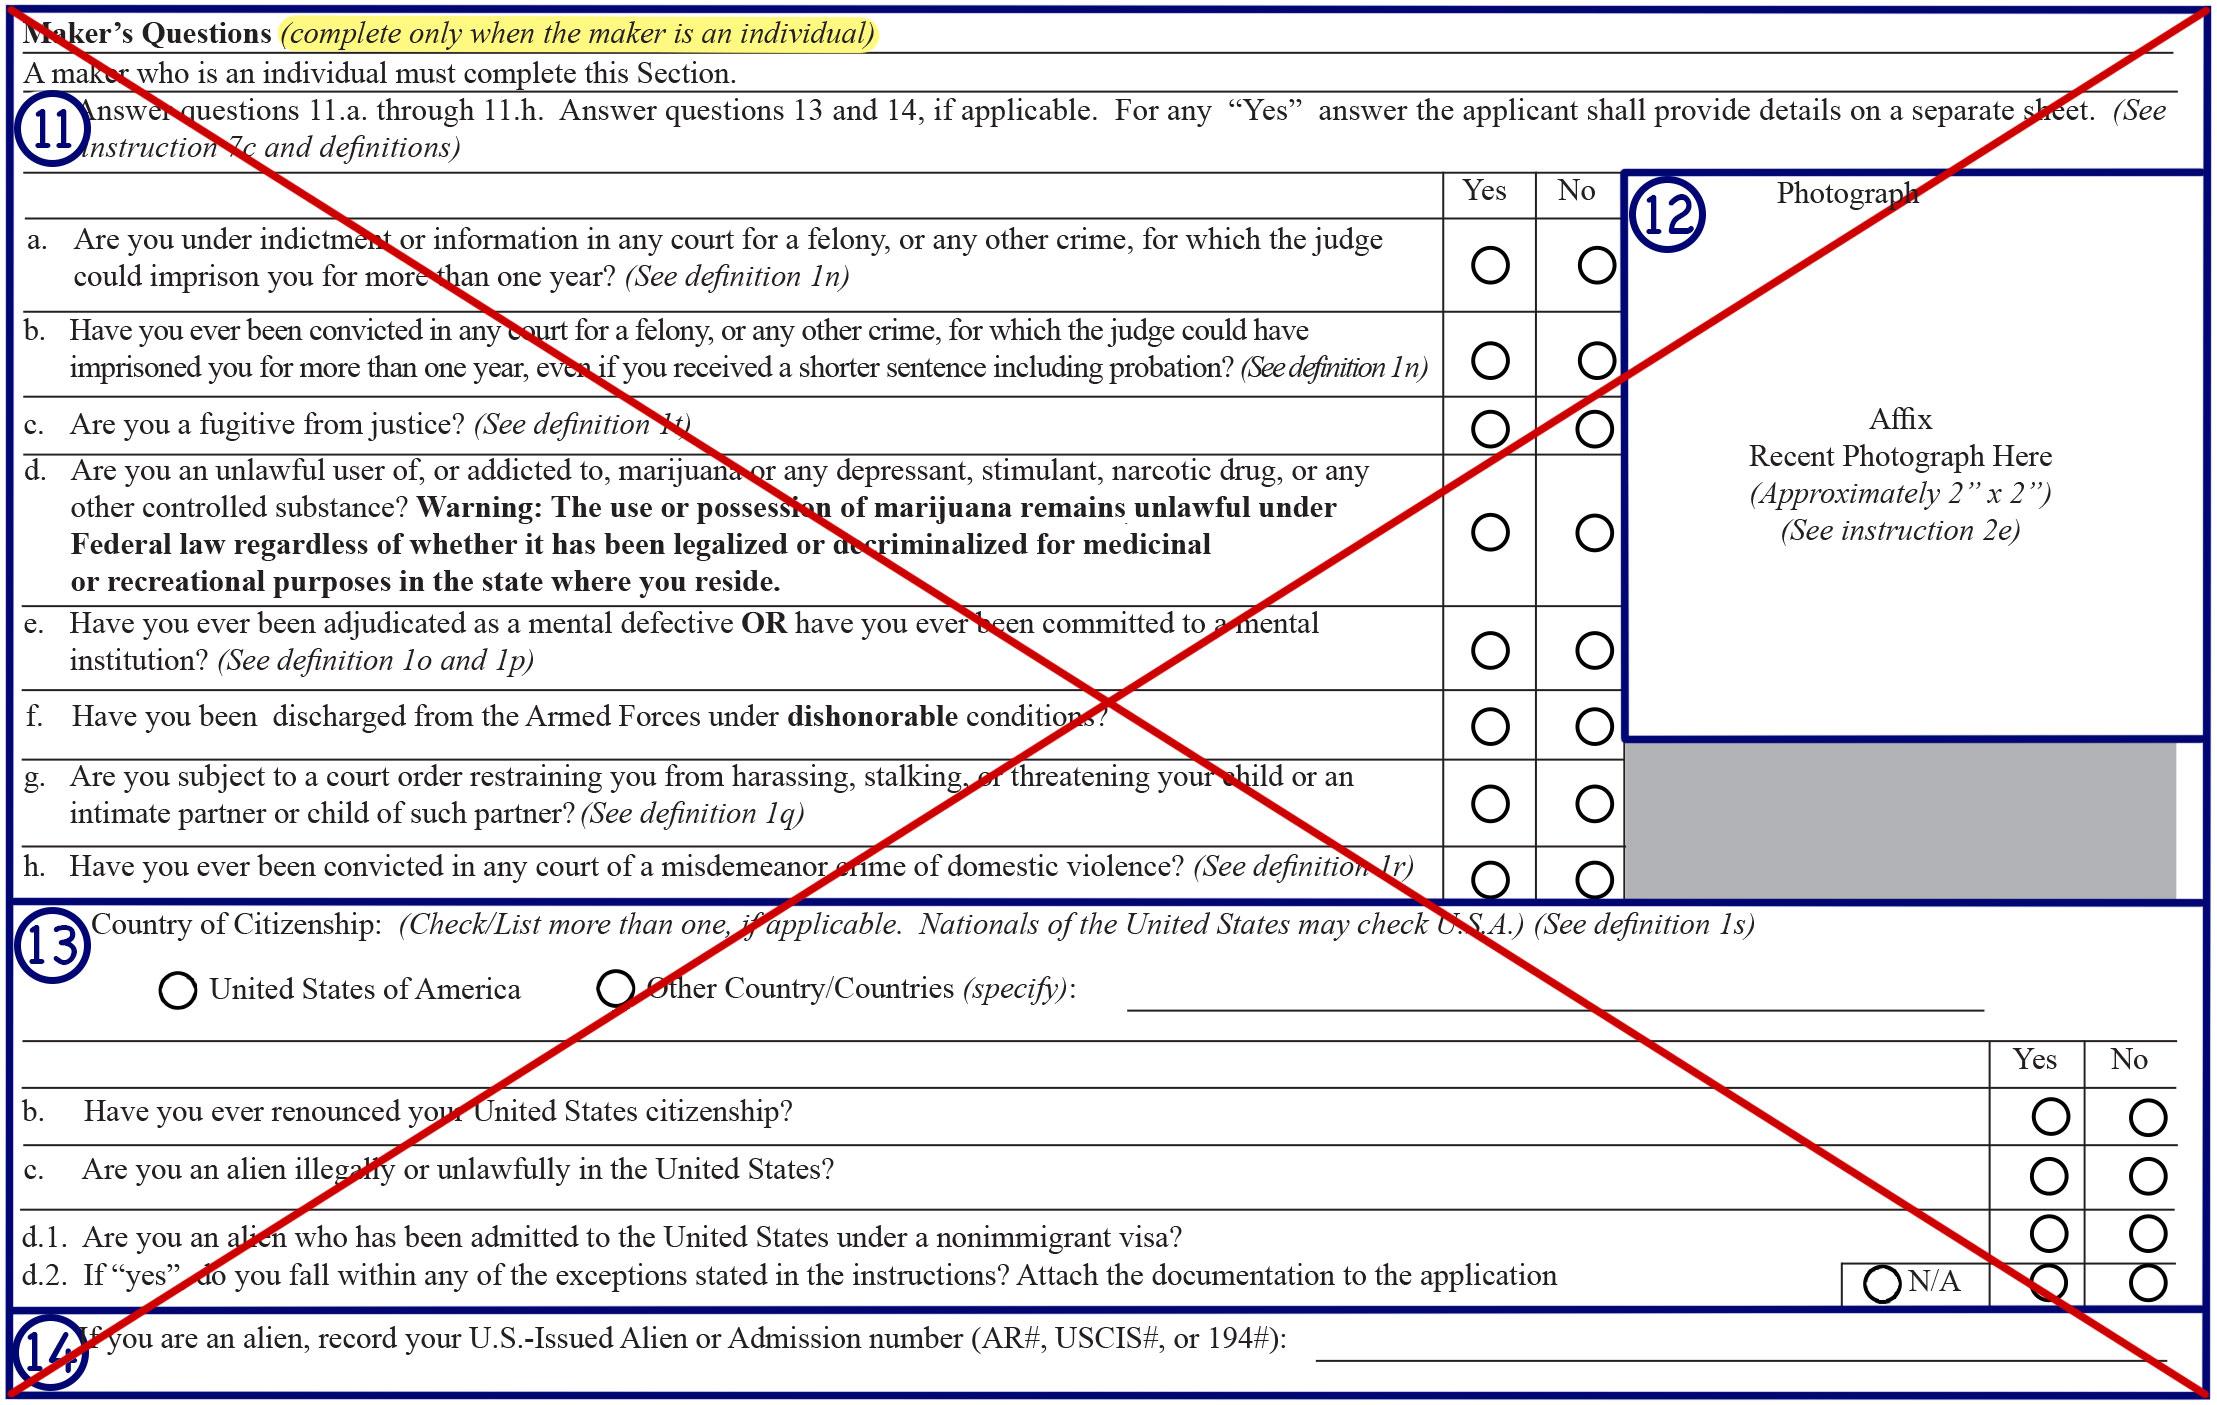 Form 1 Box 11, 12, 13 & 14